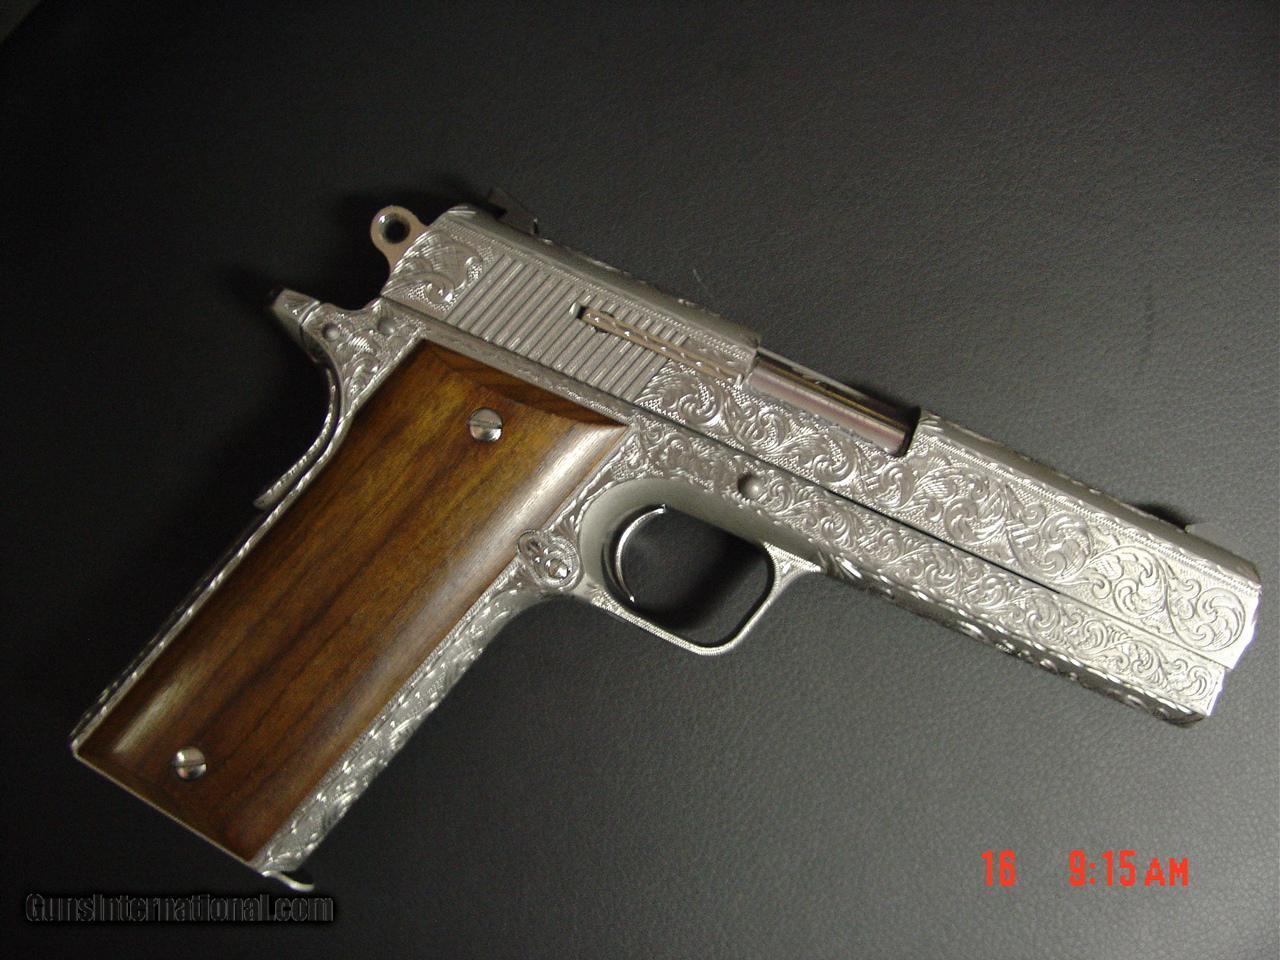 Coonan Arms 357 magnum, model